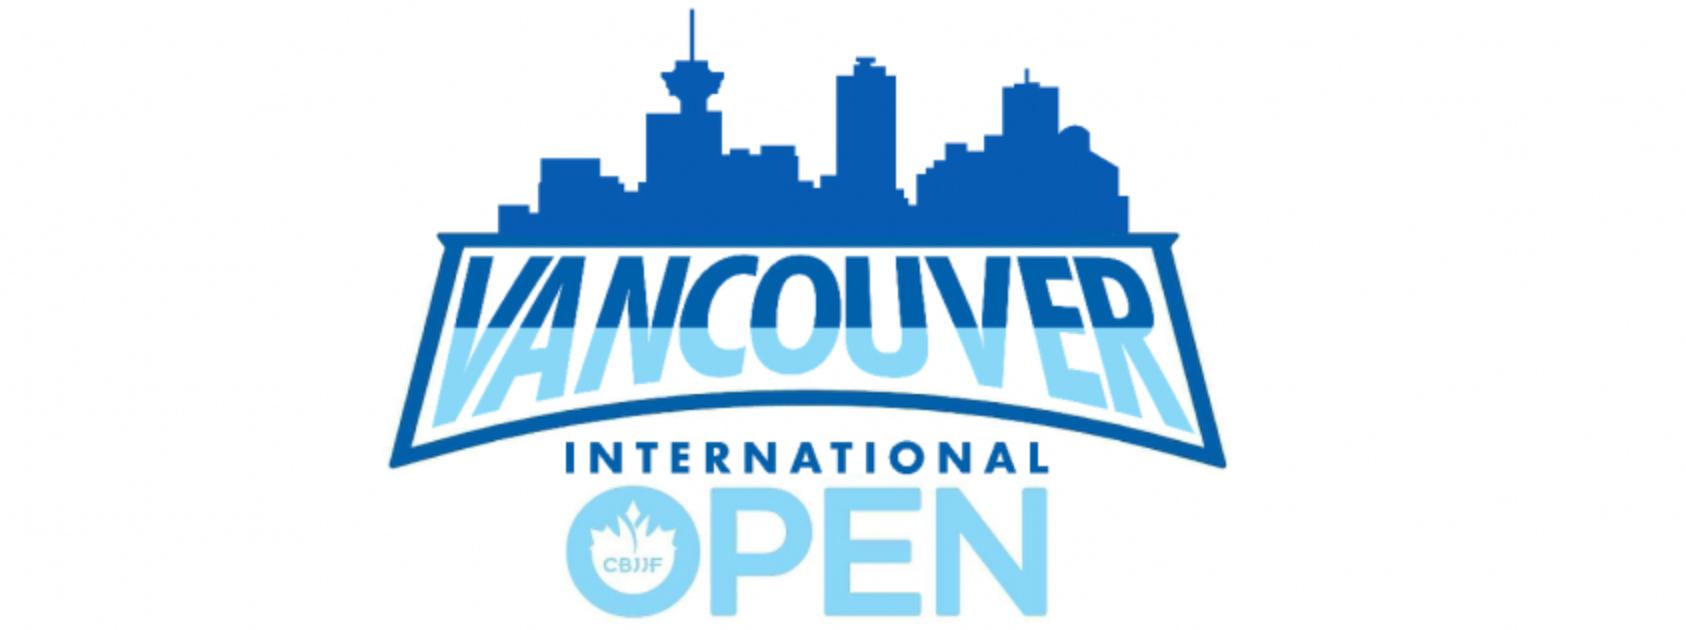 CBJJF VIO 2019 Vancouver International Open